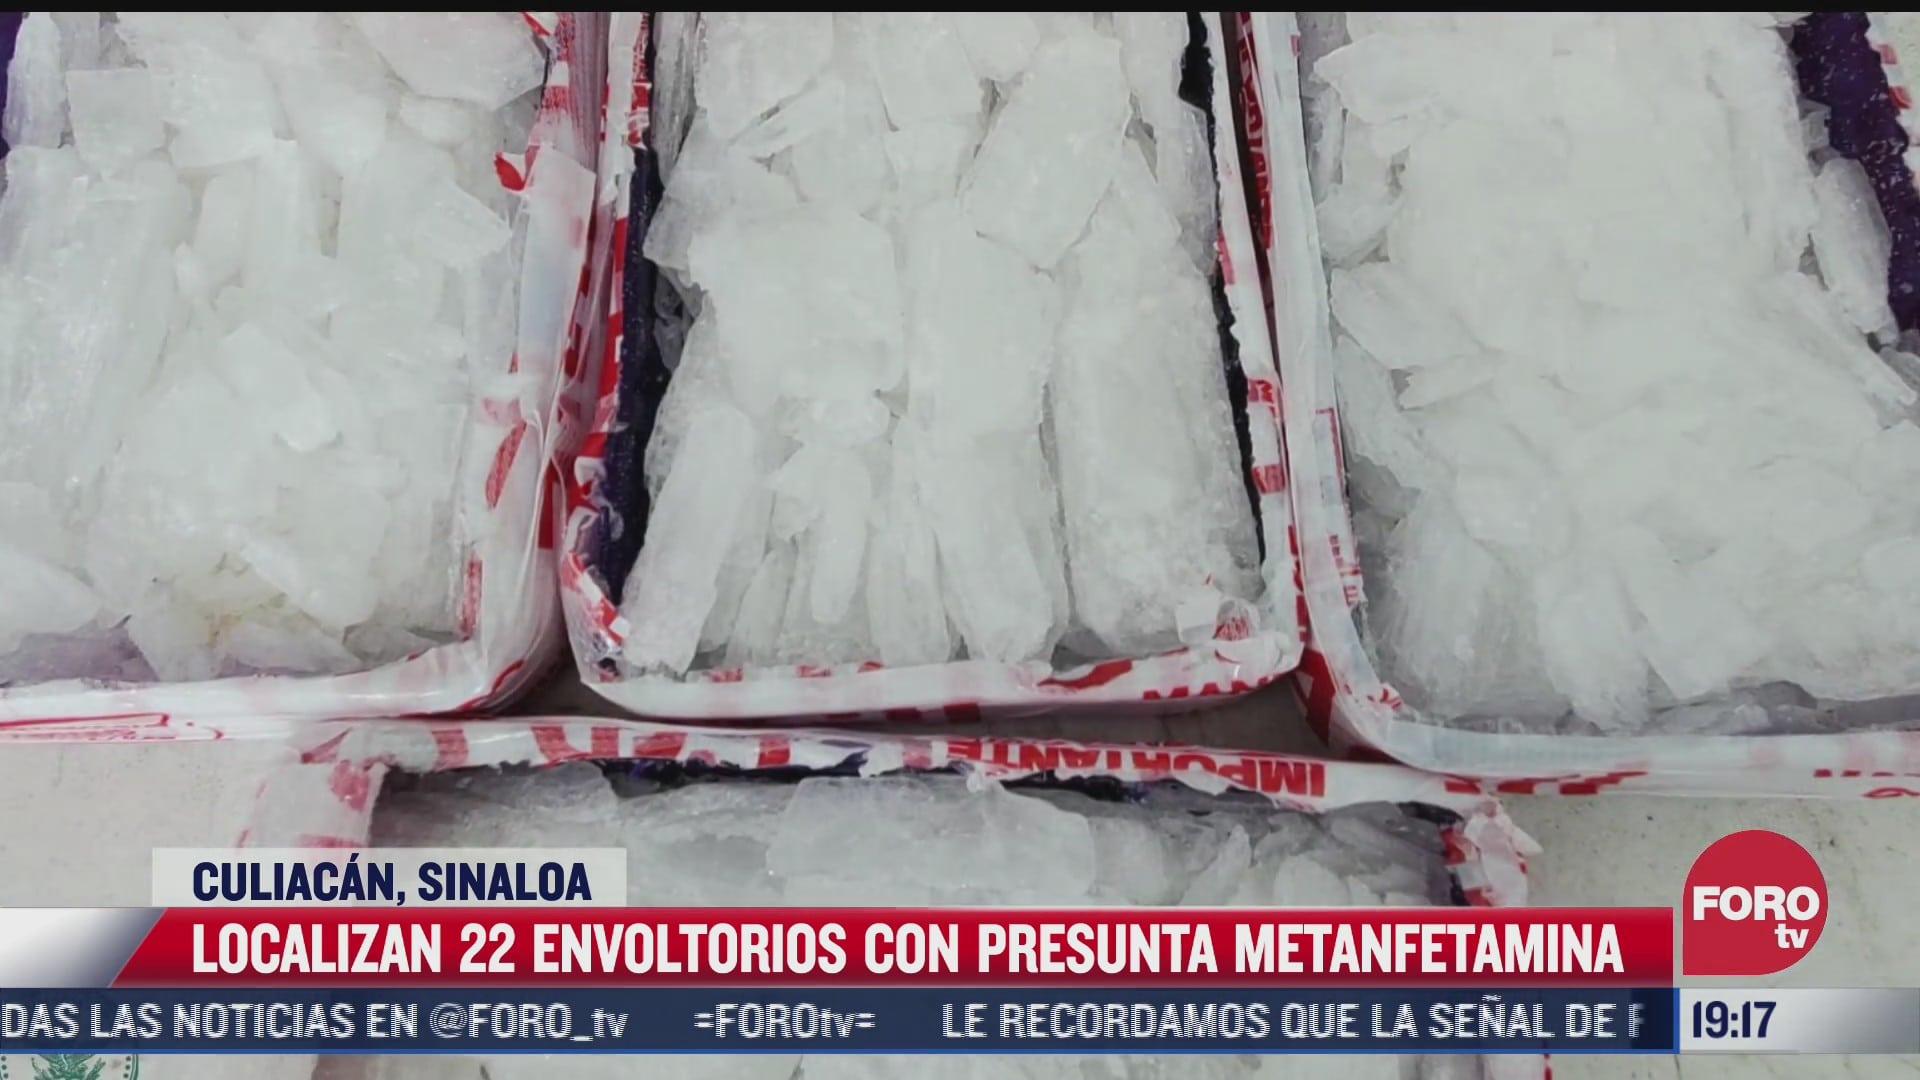 hallan 22 envoltorios de metanfetamina dentro de futbolito